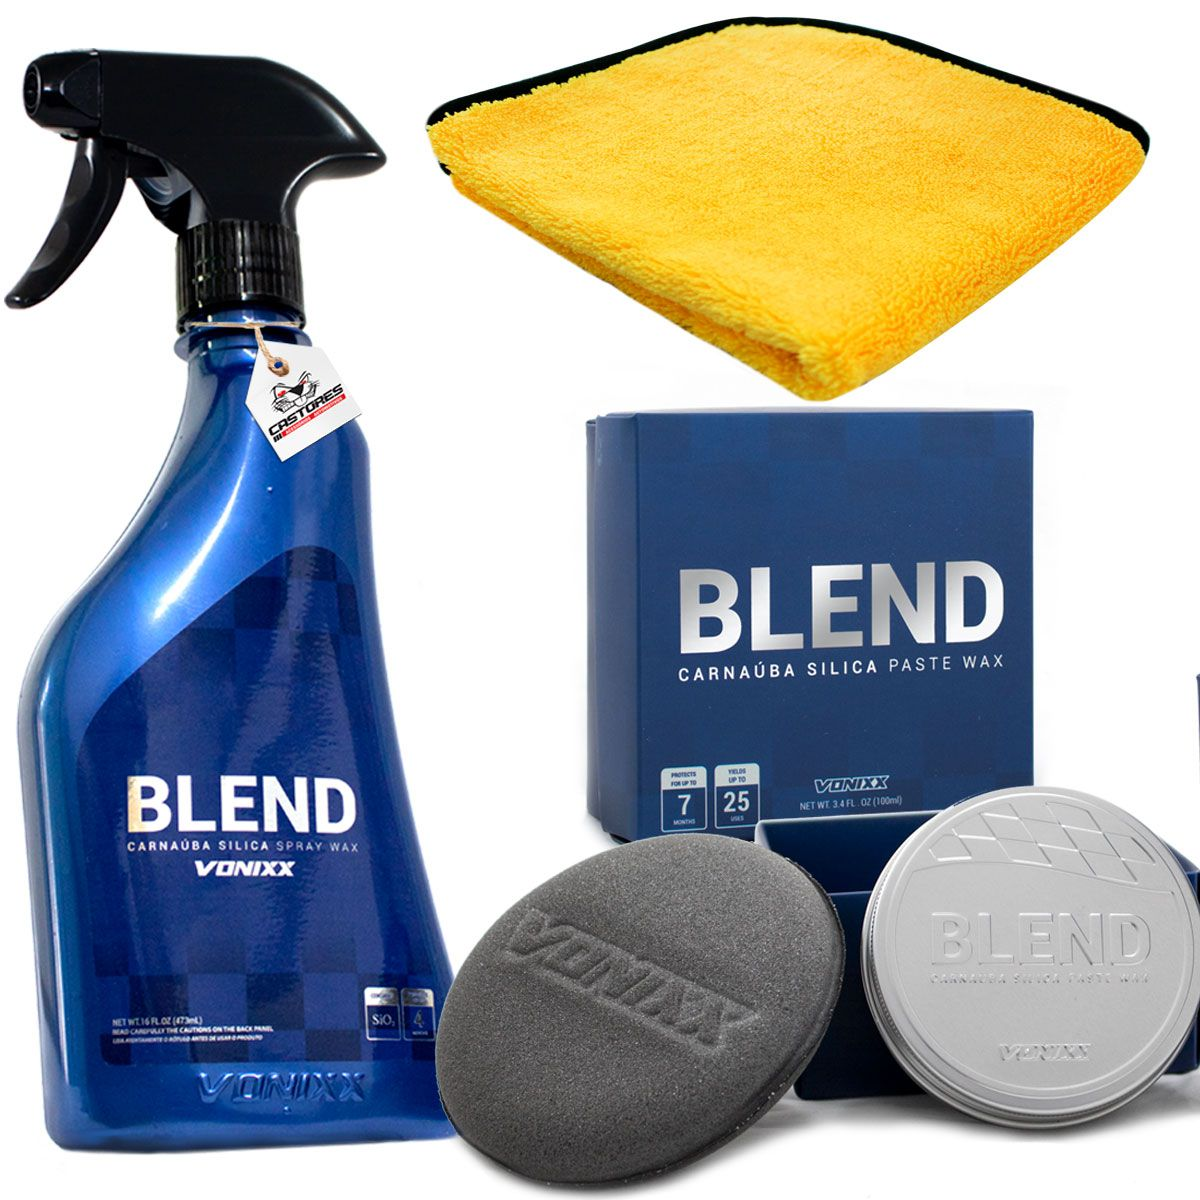 Kit Premium Para Enceramento Blend Spray + Pasta Vonixx + Toalha Amarela